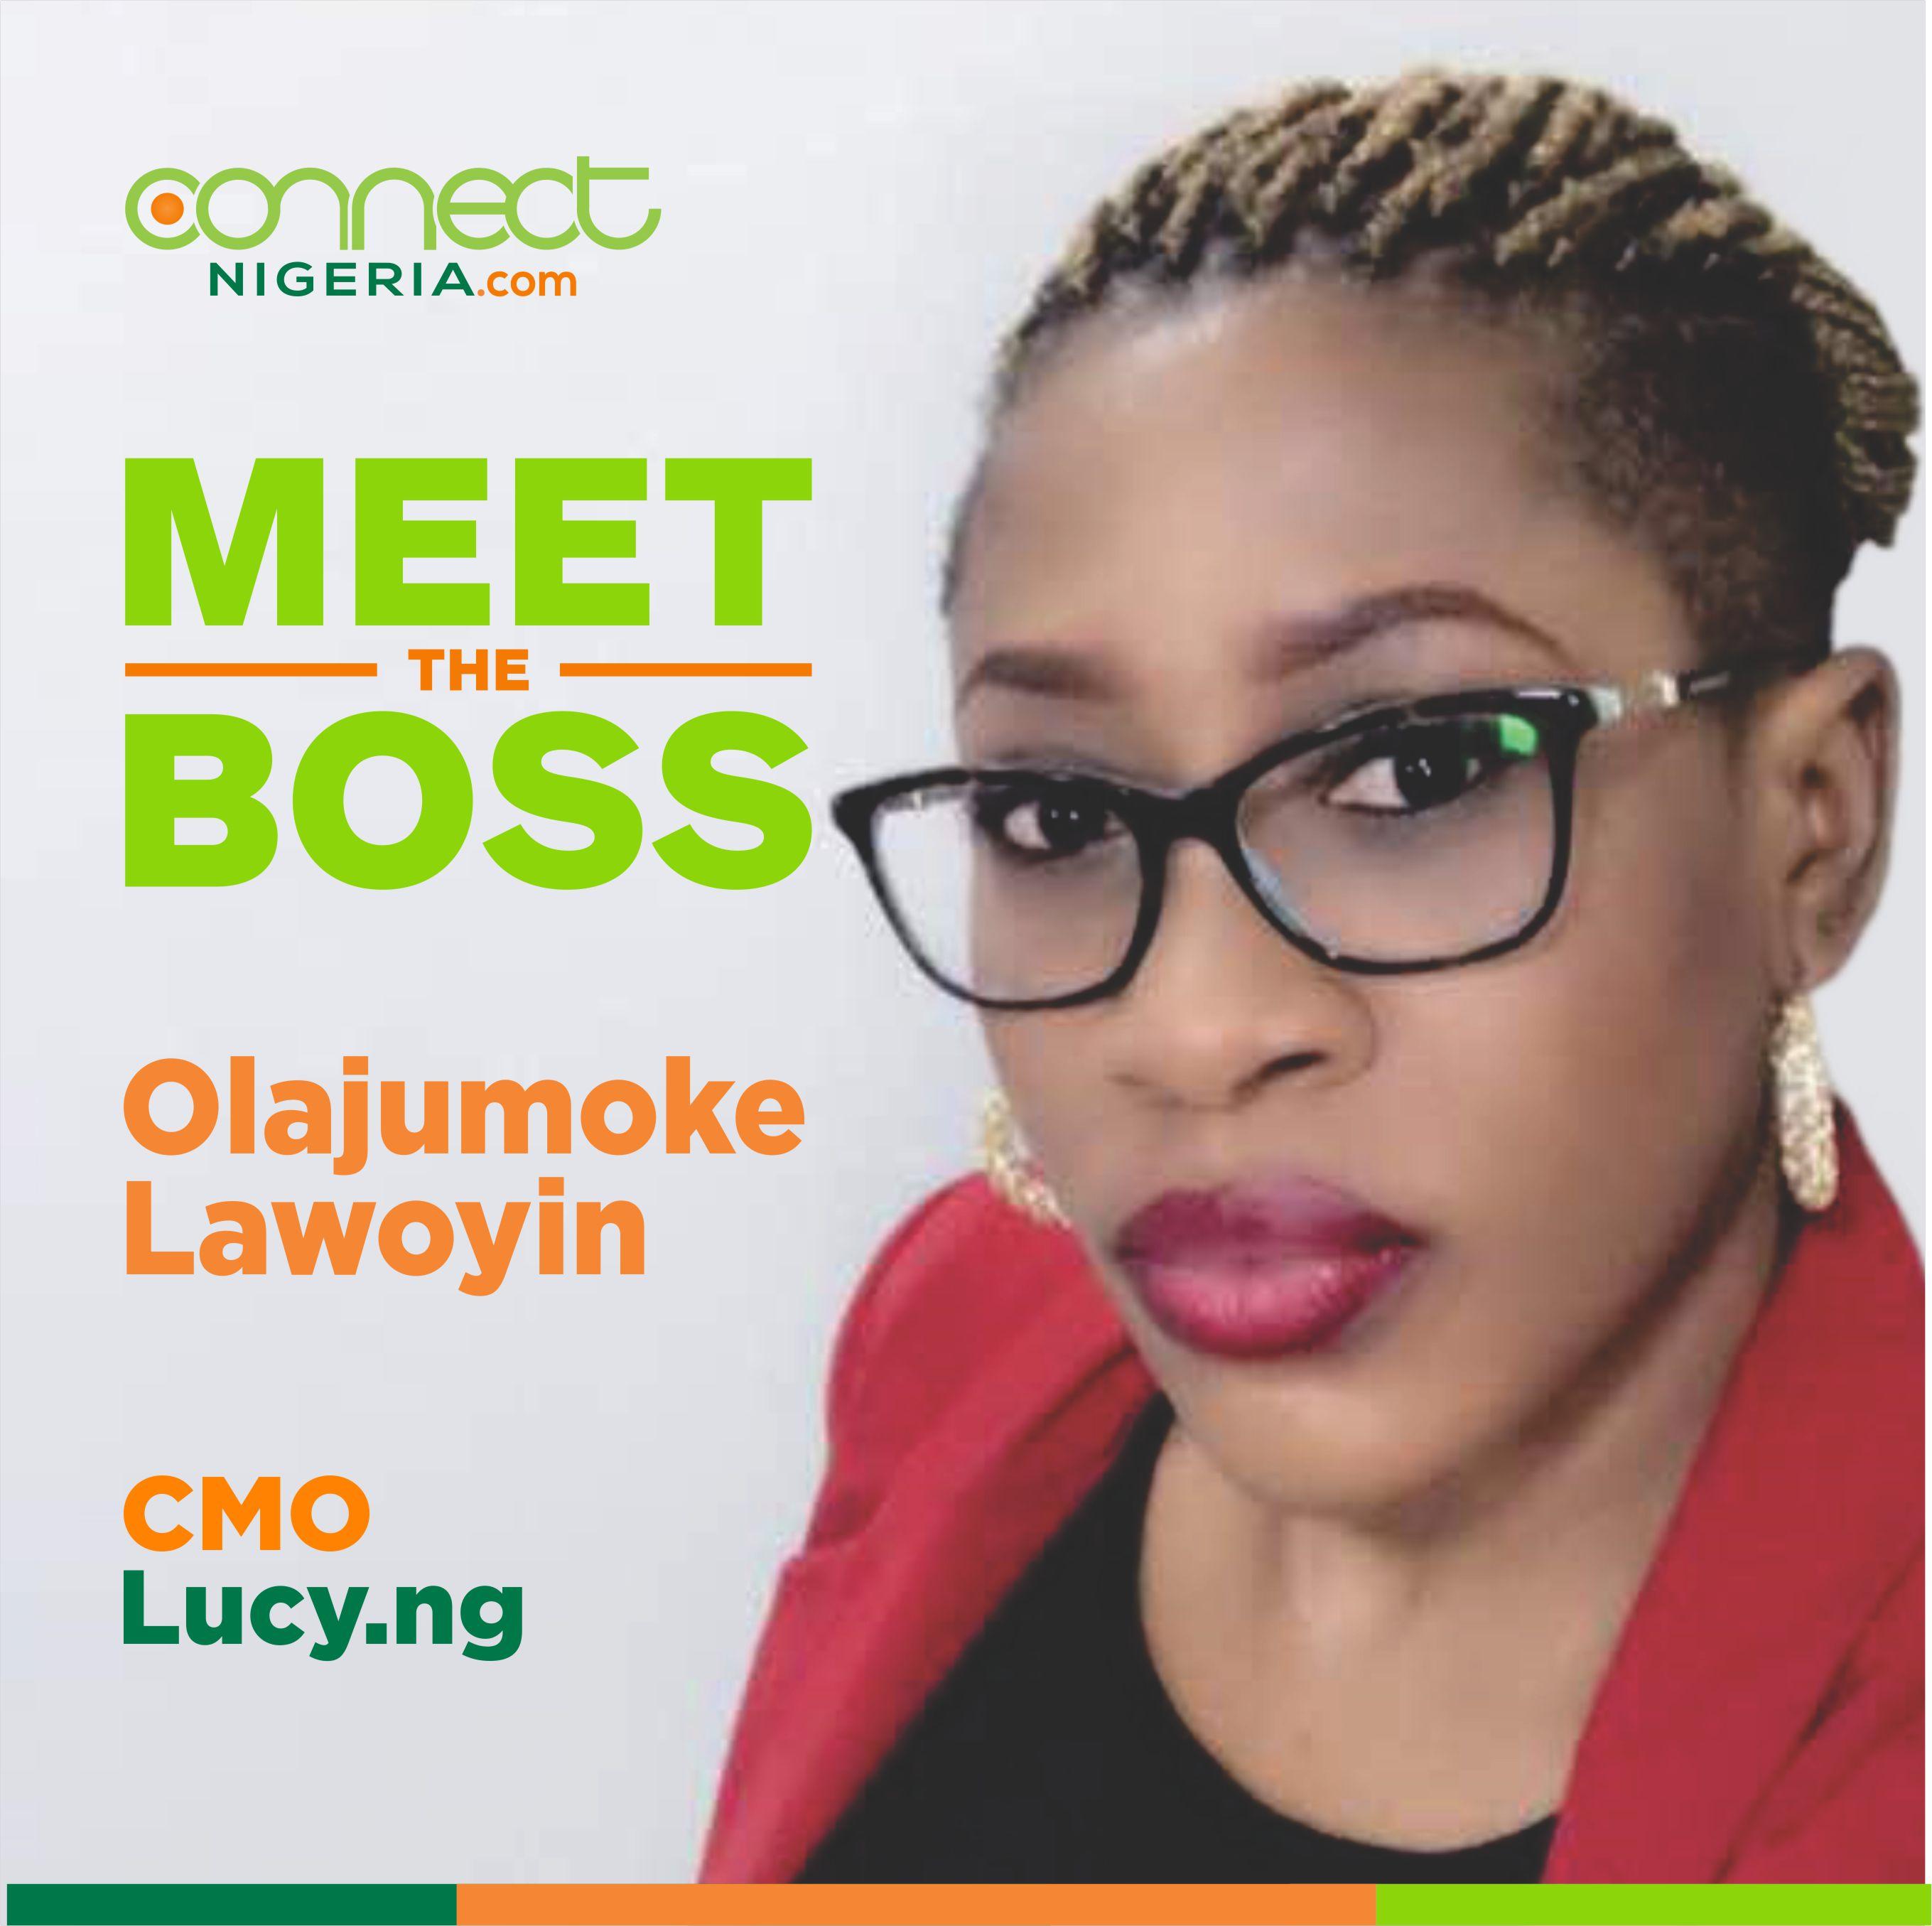 Meet the Boss: Olajumoke Lawoyin, CMO Lucy.ng - www.connectnigeria.com